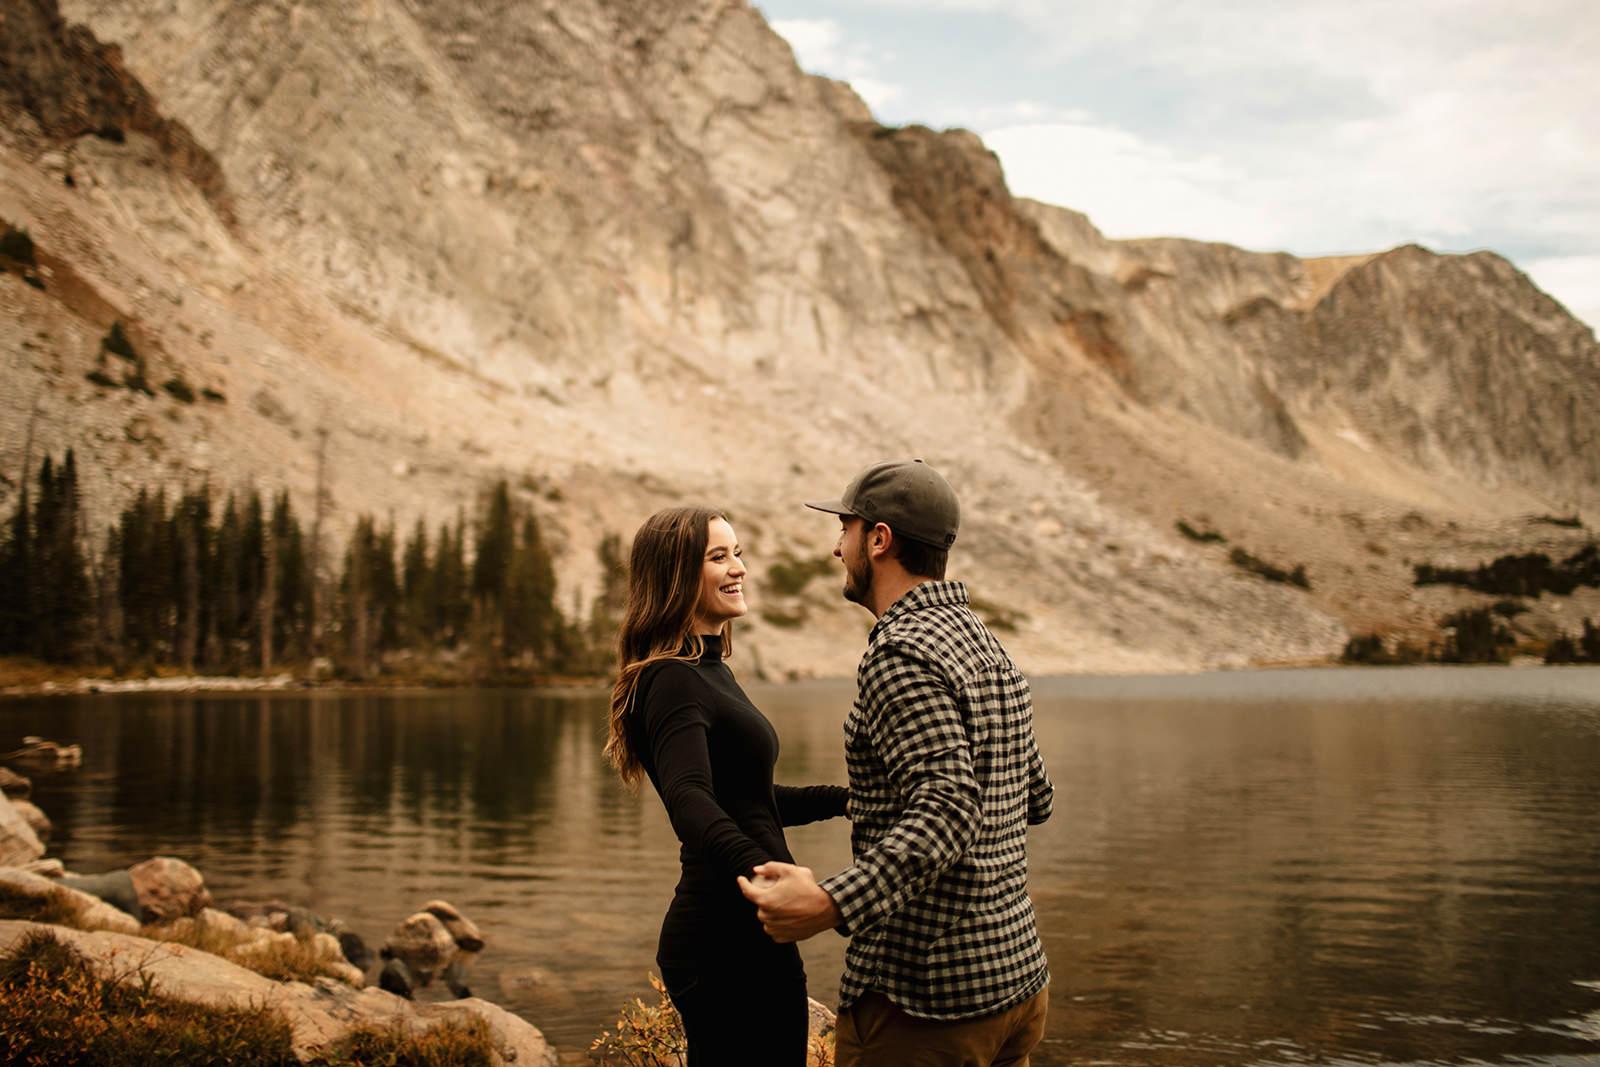 Liz Osban Photography Cheyenne Wyoming Engagement Wedding Photographer couple adventure elopement wedding laramie denver fort collins colorado rocky mountain national park14.jpg